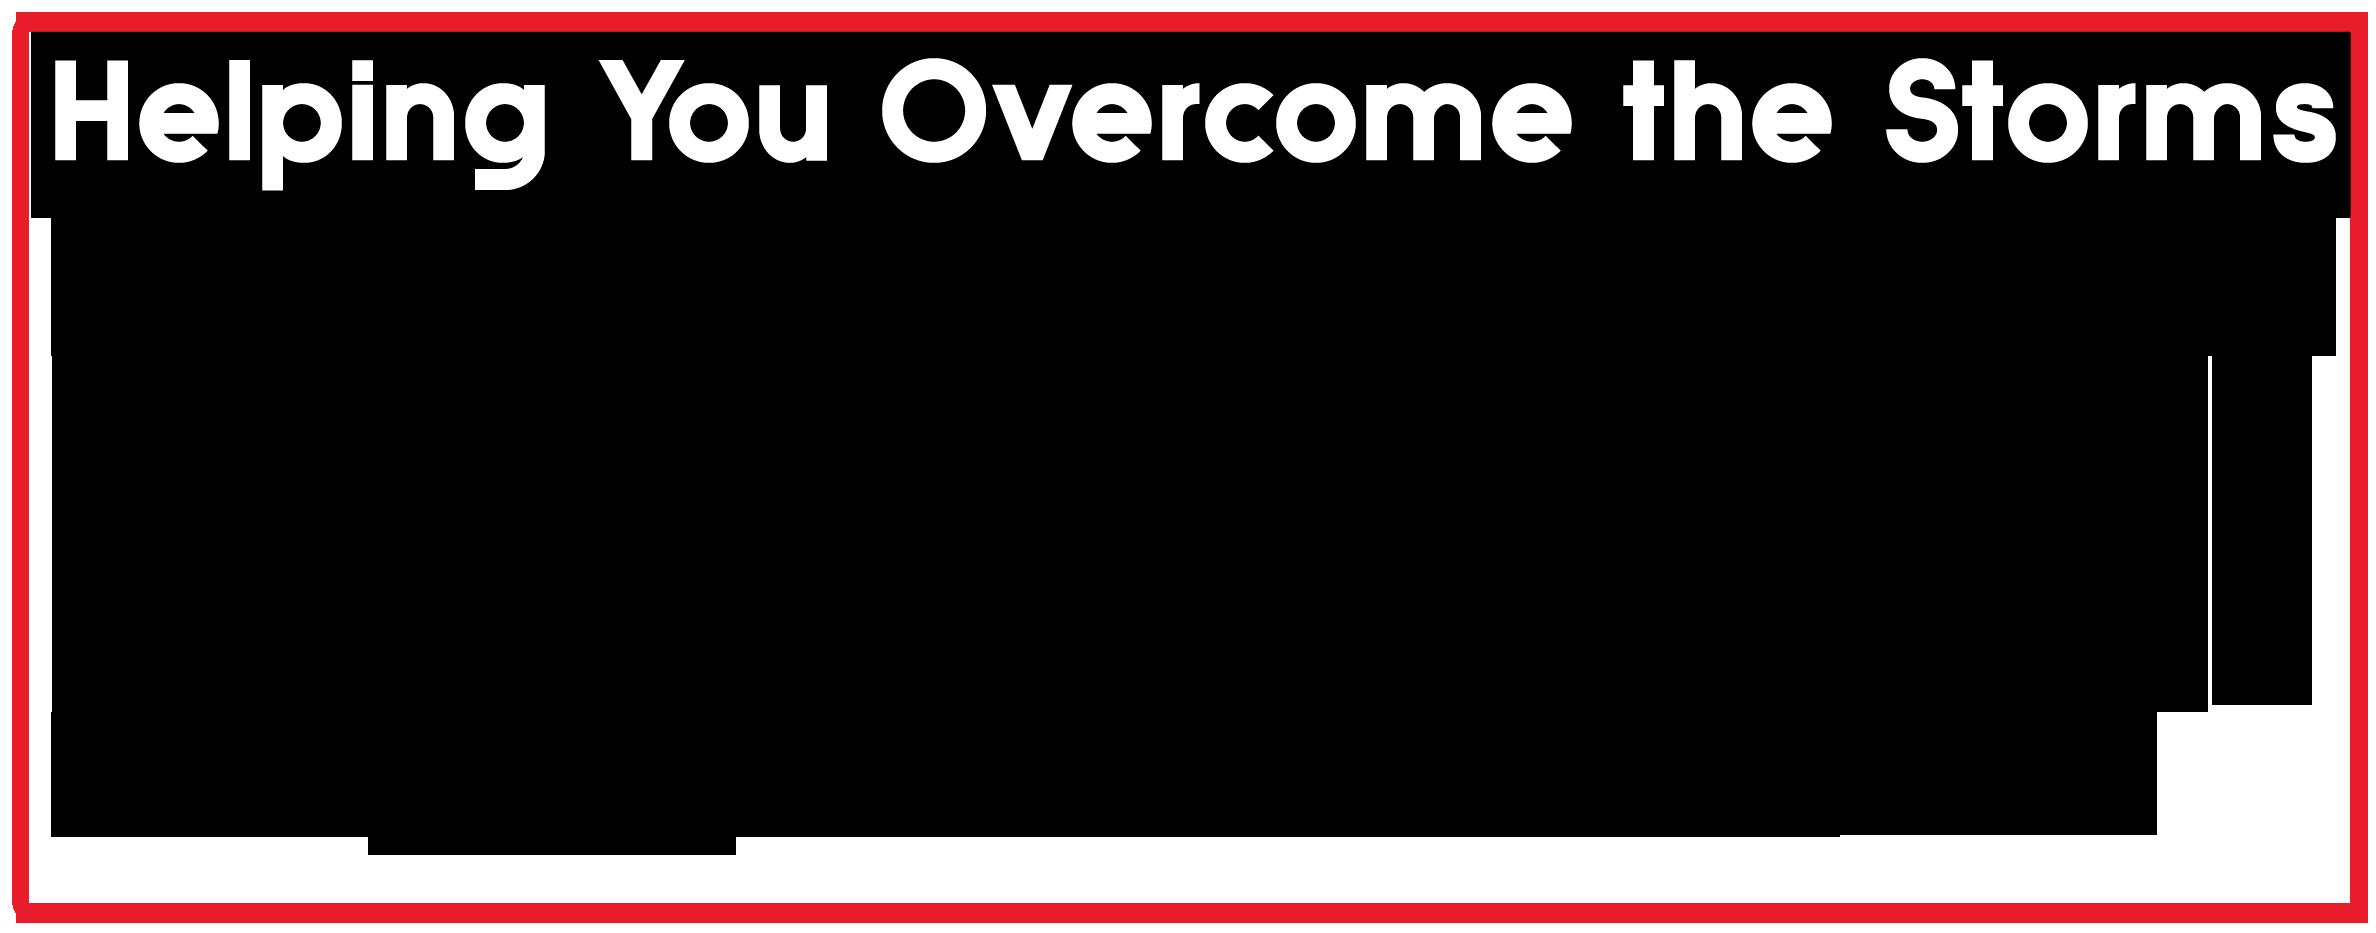 Overcome-storms